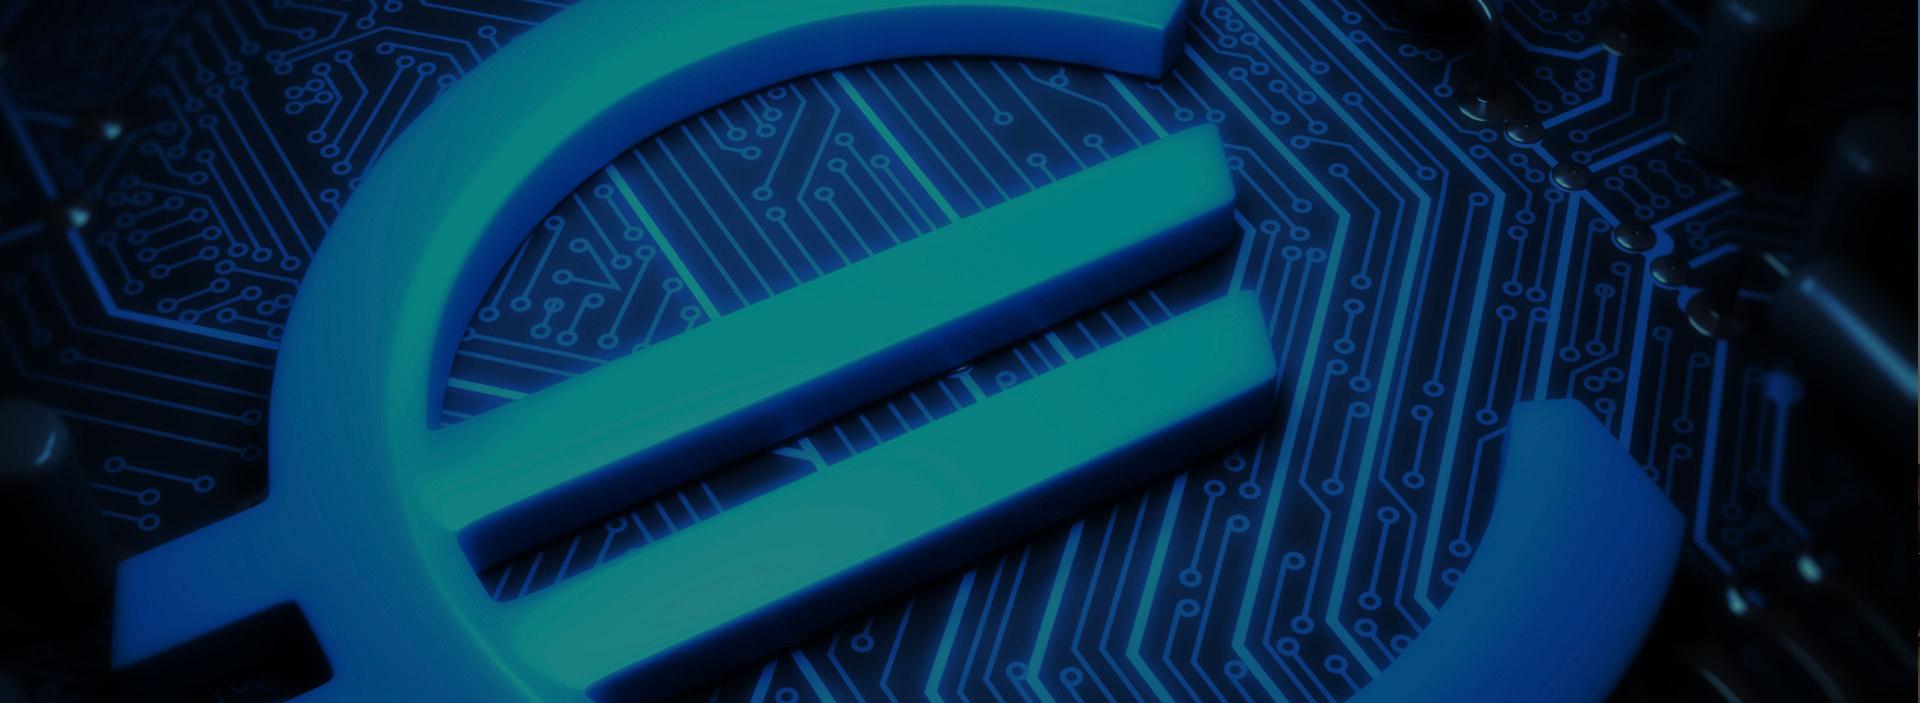 10 fintech companies outsourcing to Ukrainian developers